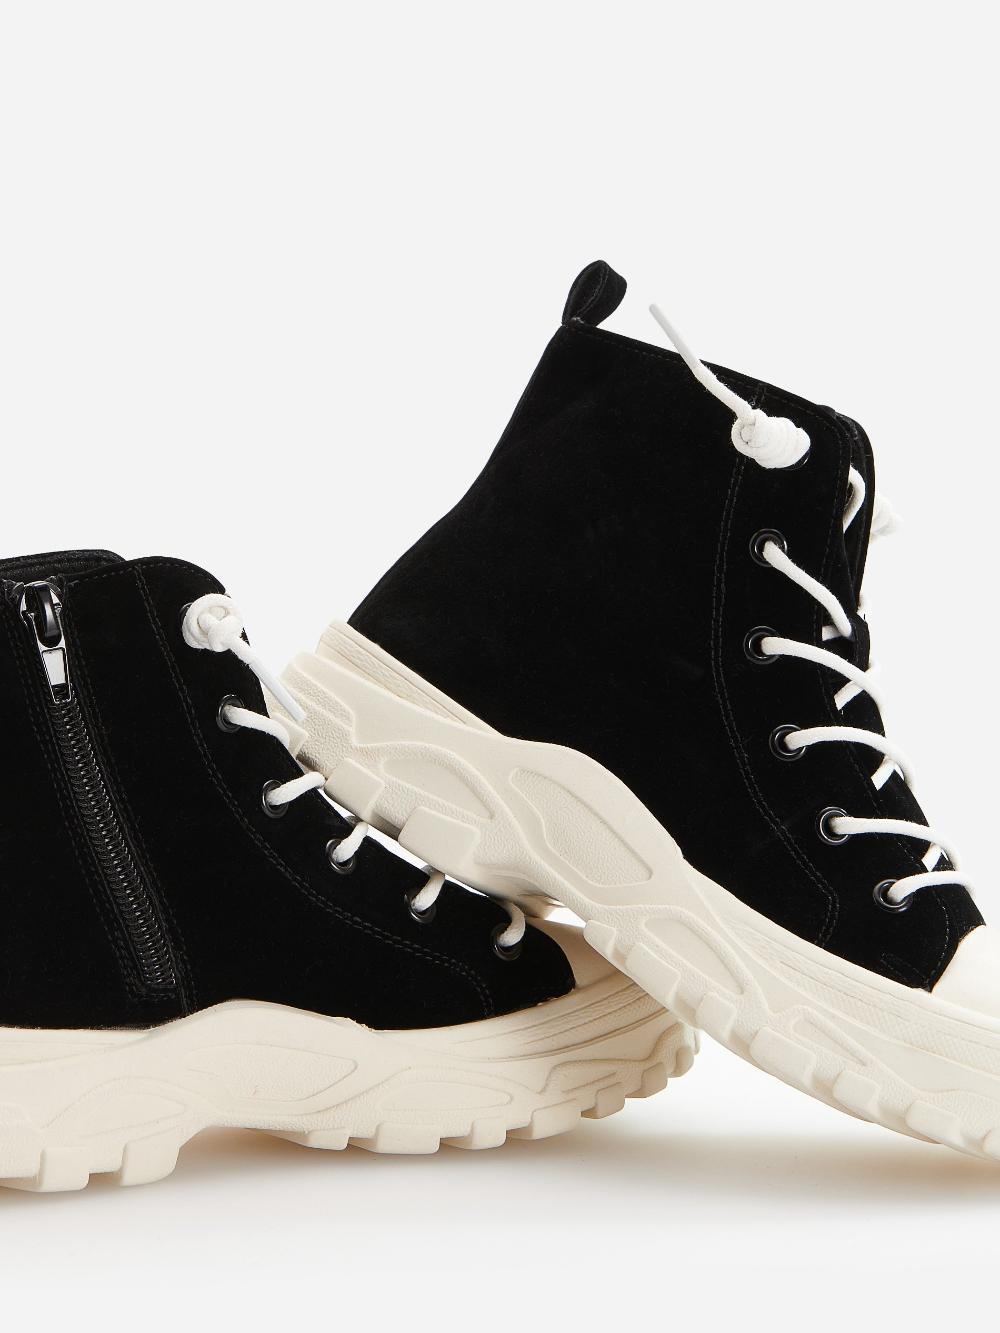 Kupuj Online Wysokie Buty Trekkingowe Reserved Zv150 99x High Top Sneakers Shoes Sneakers